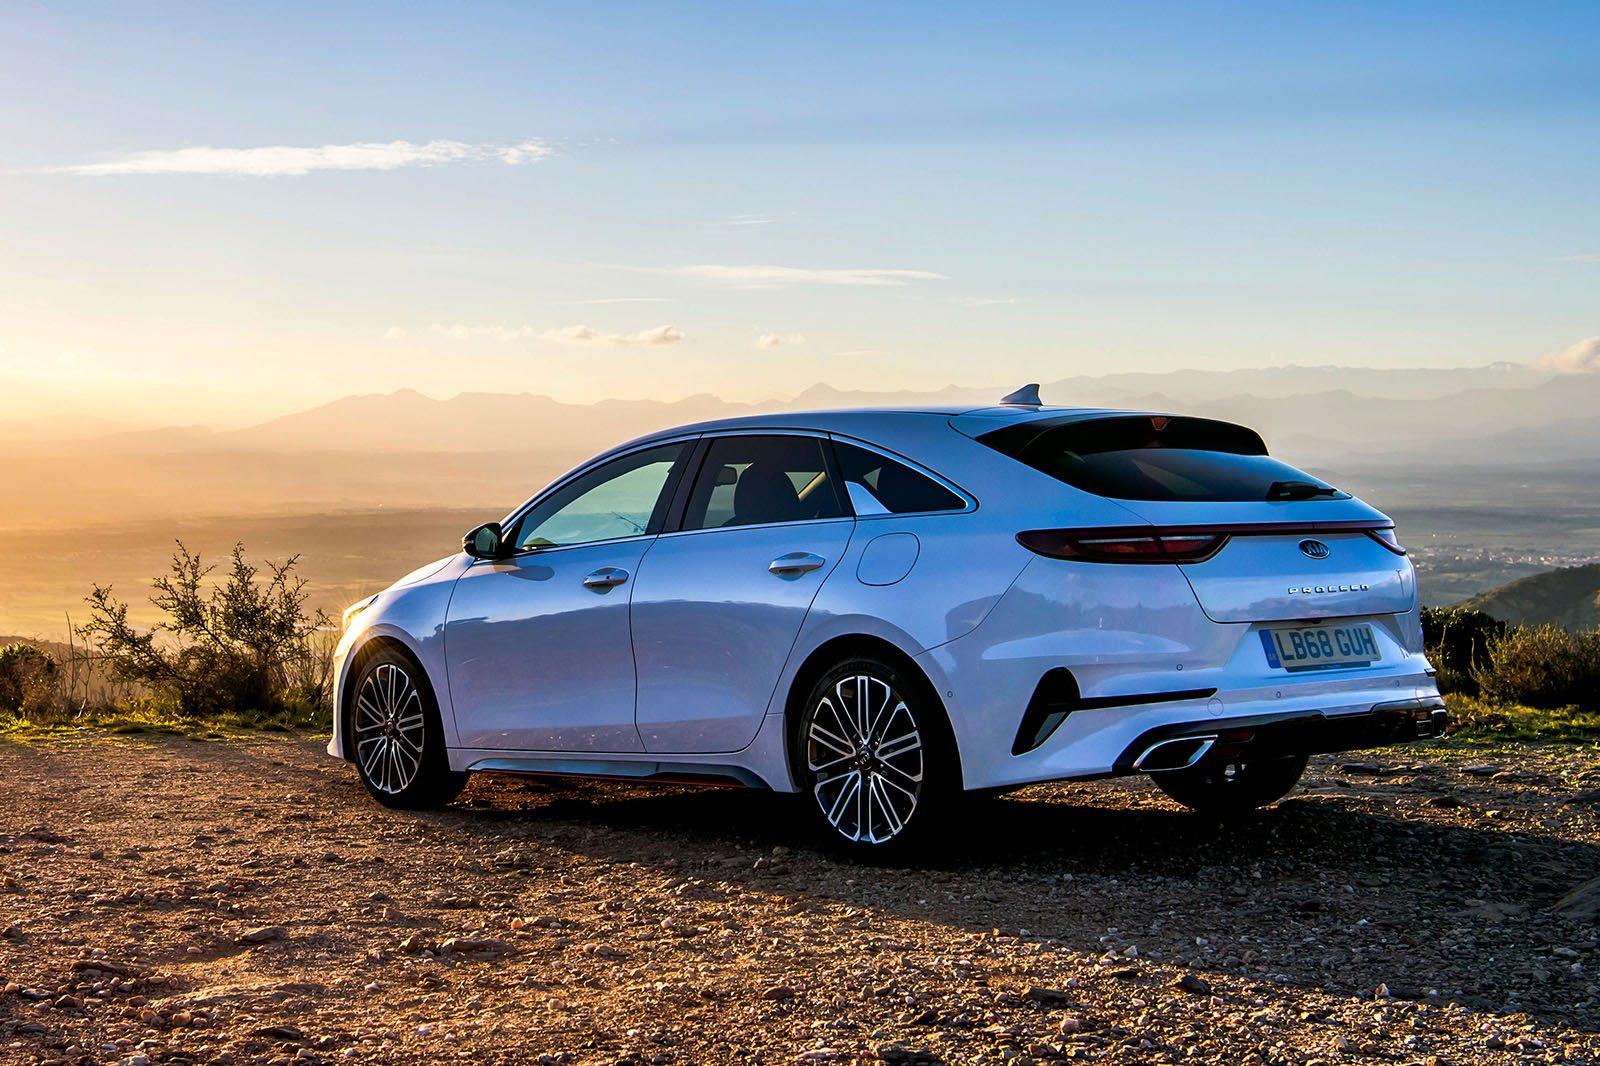 2019 Kia Proceed rear sunset